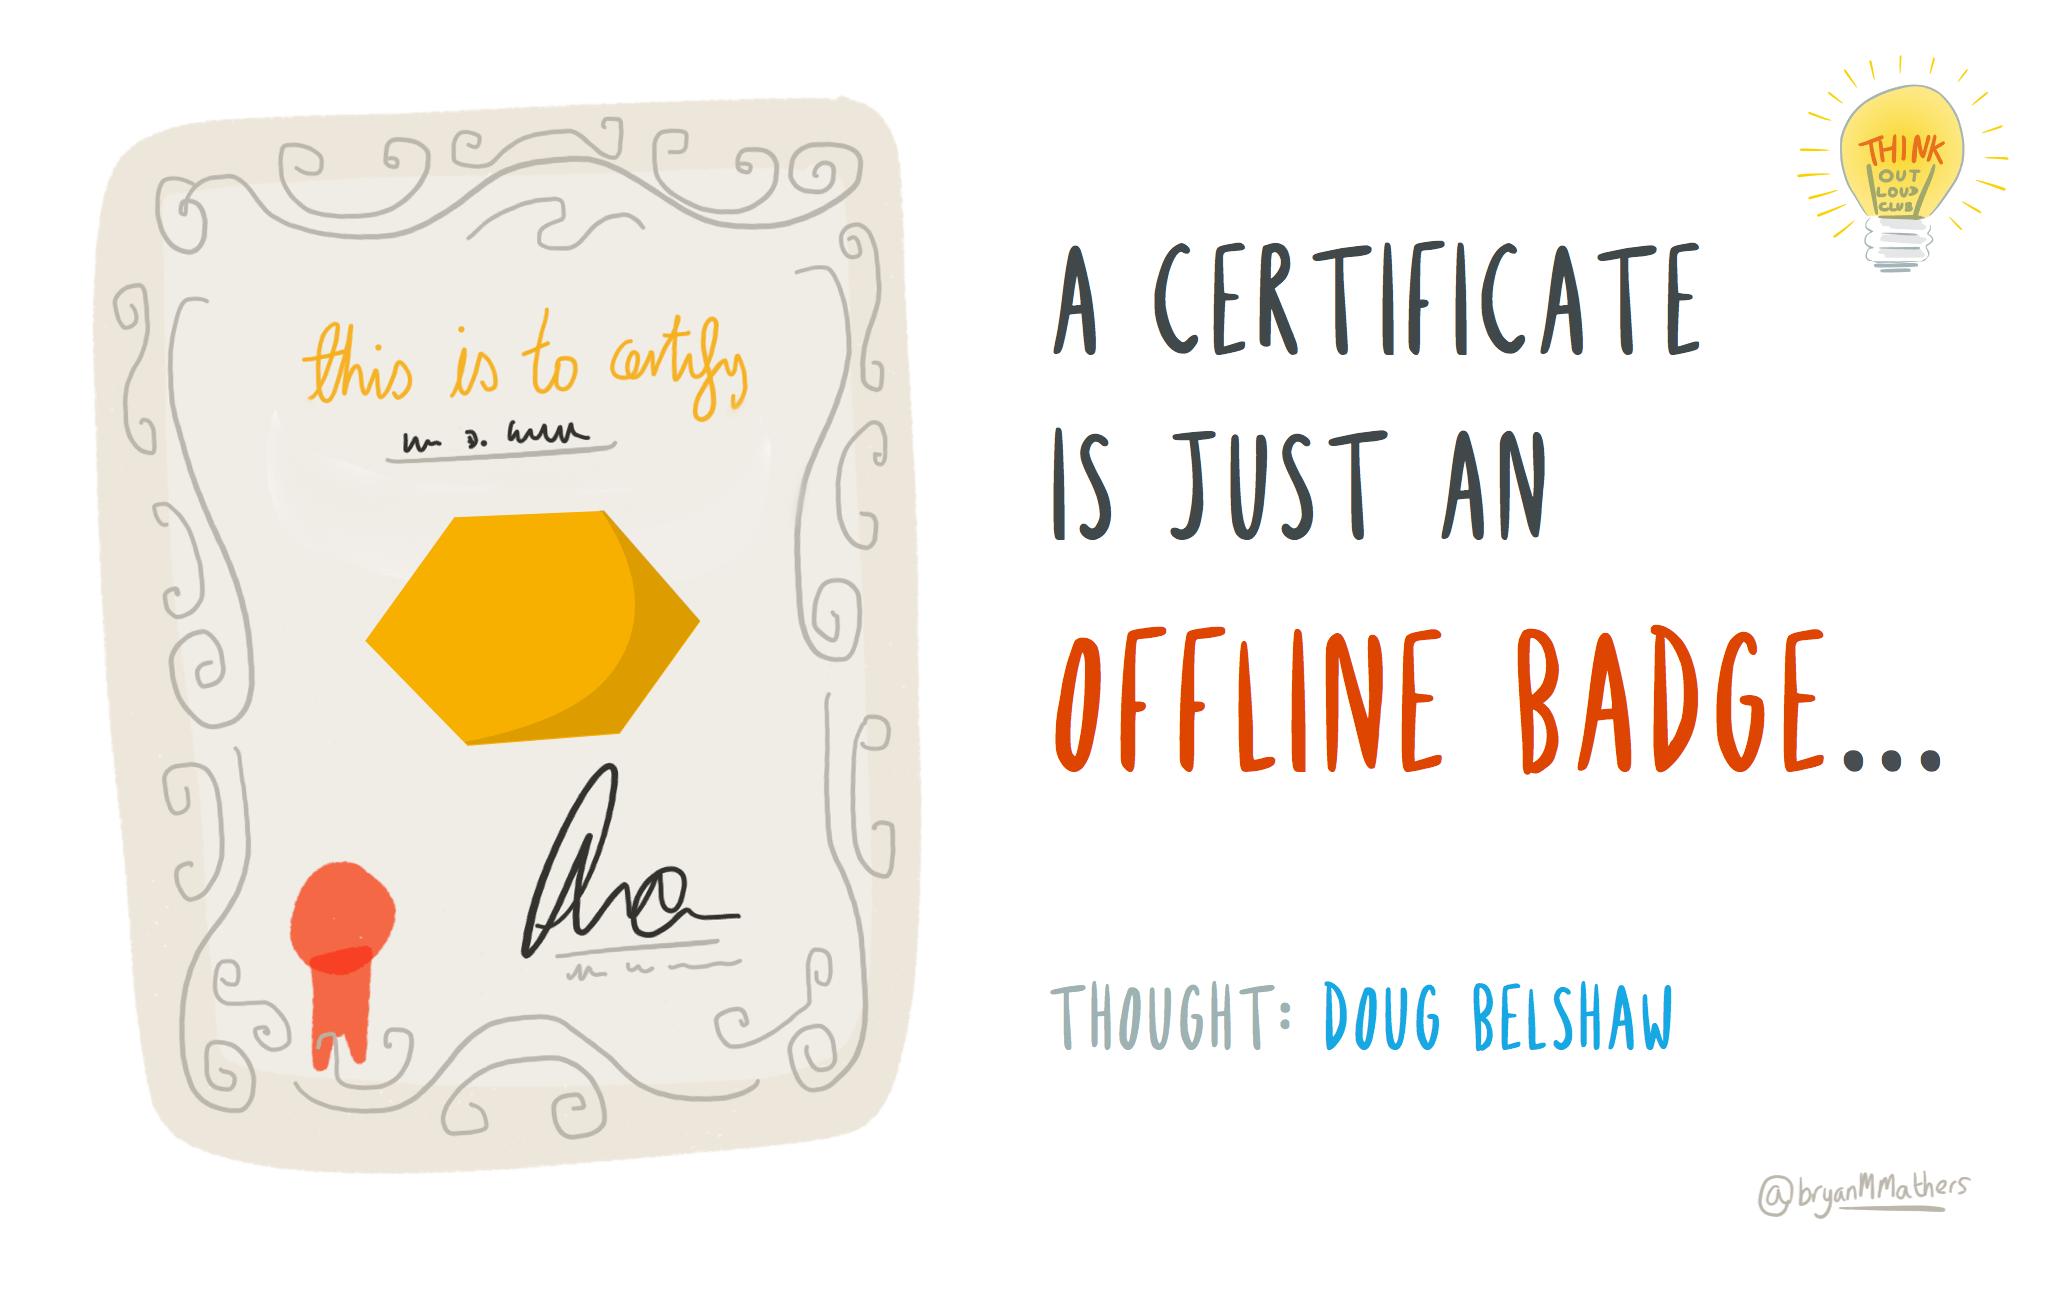 A certificate is just an offline badge